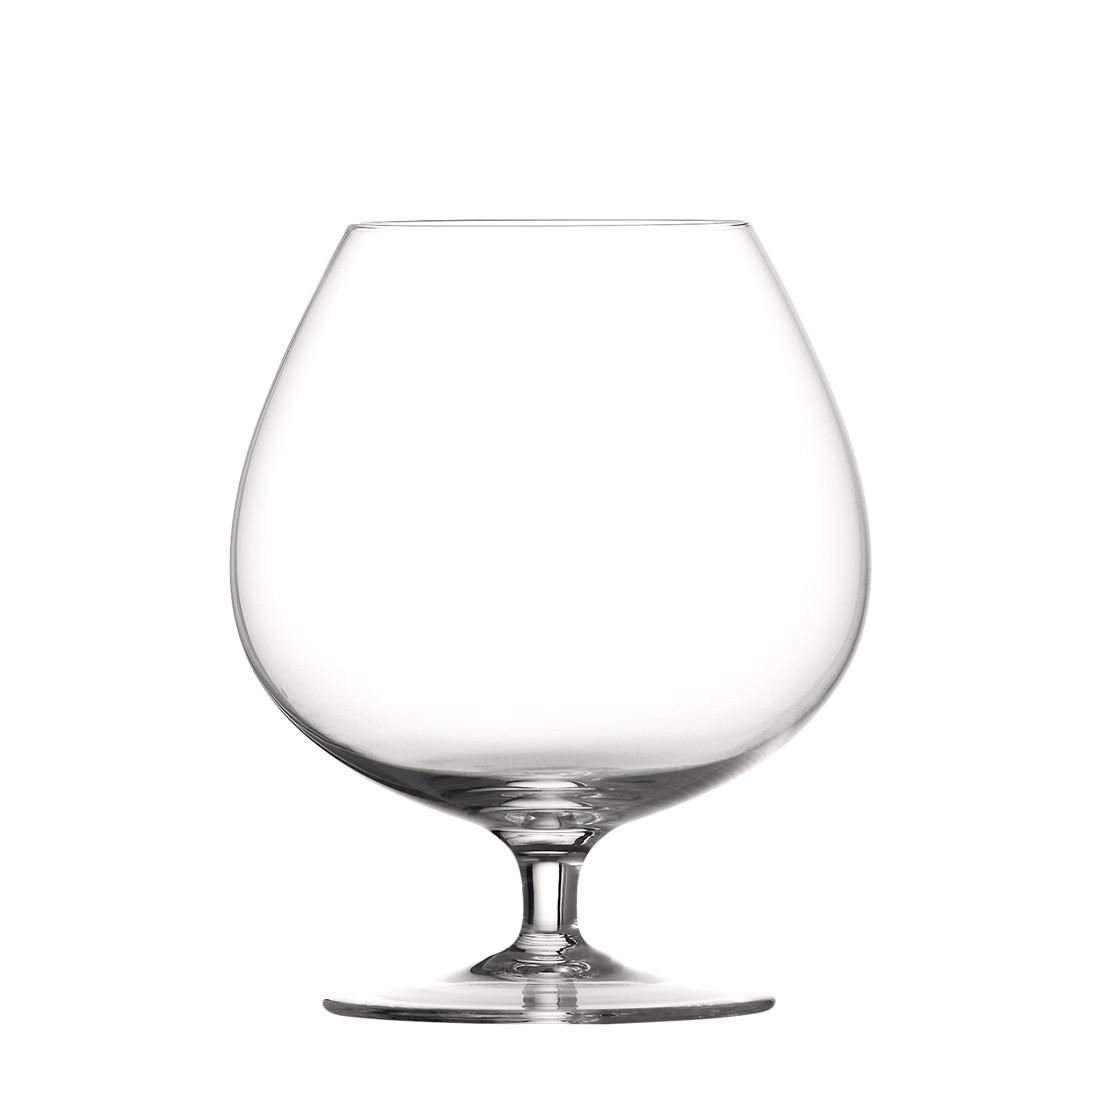 SpecialGlass Cognac-XL-Premium 6er-Set, Spiegelau günstig